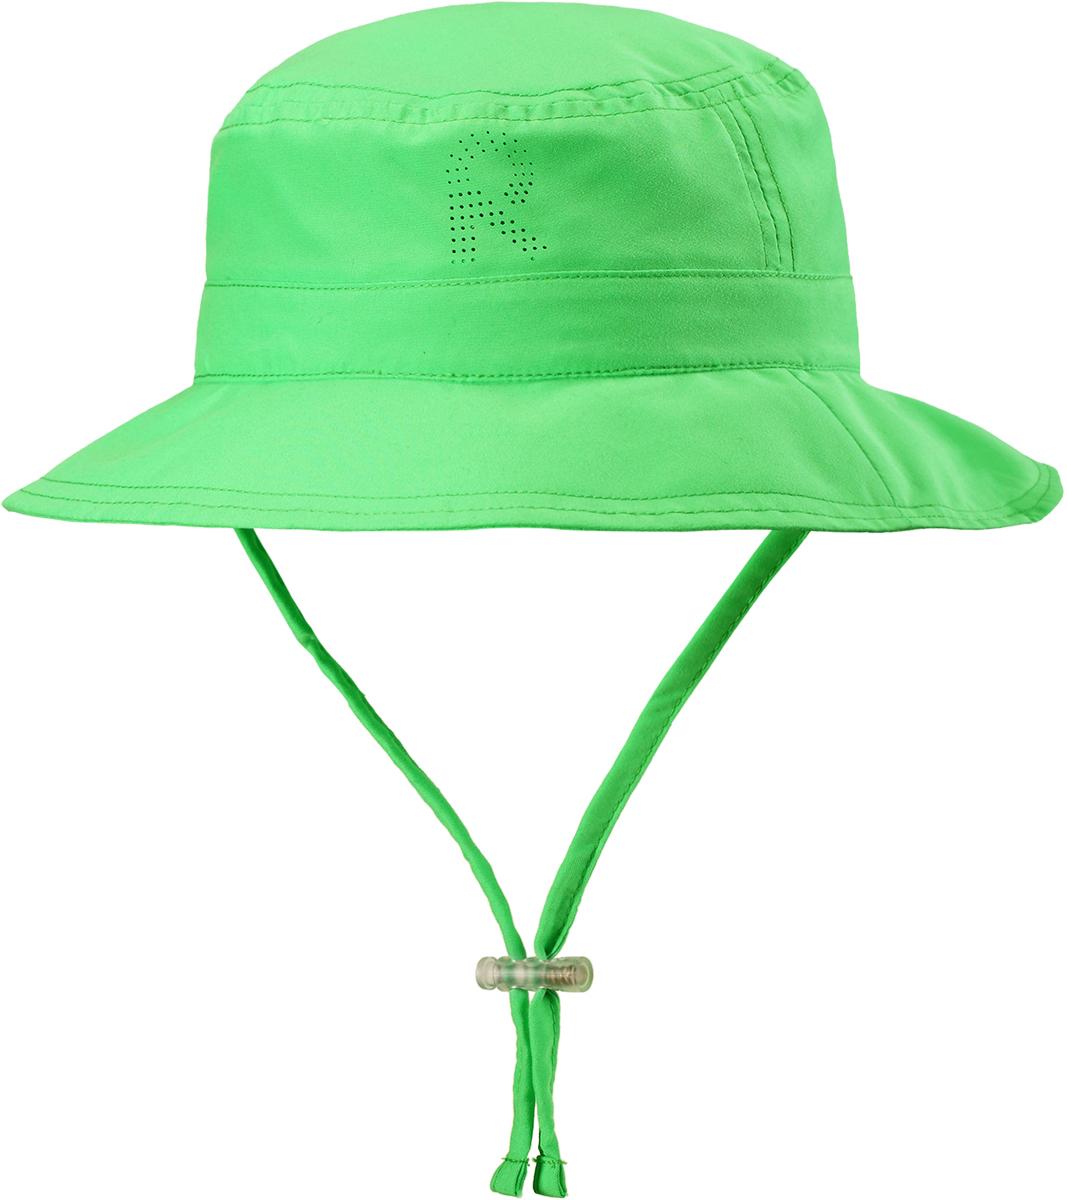 Фото Панама детская Reima Tropical, цвет: зеленый. 5285318460. Размер 46